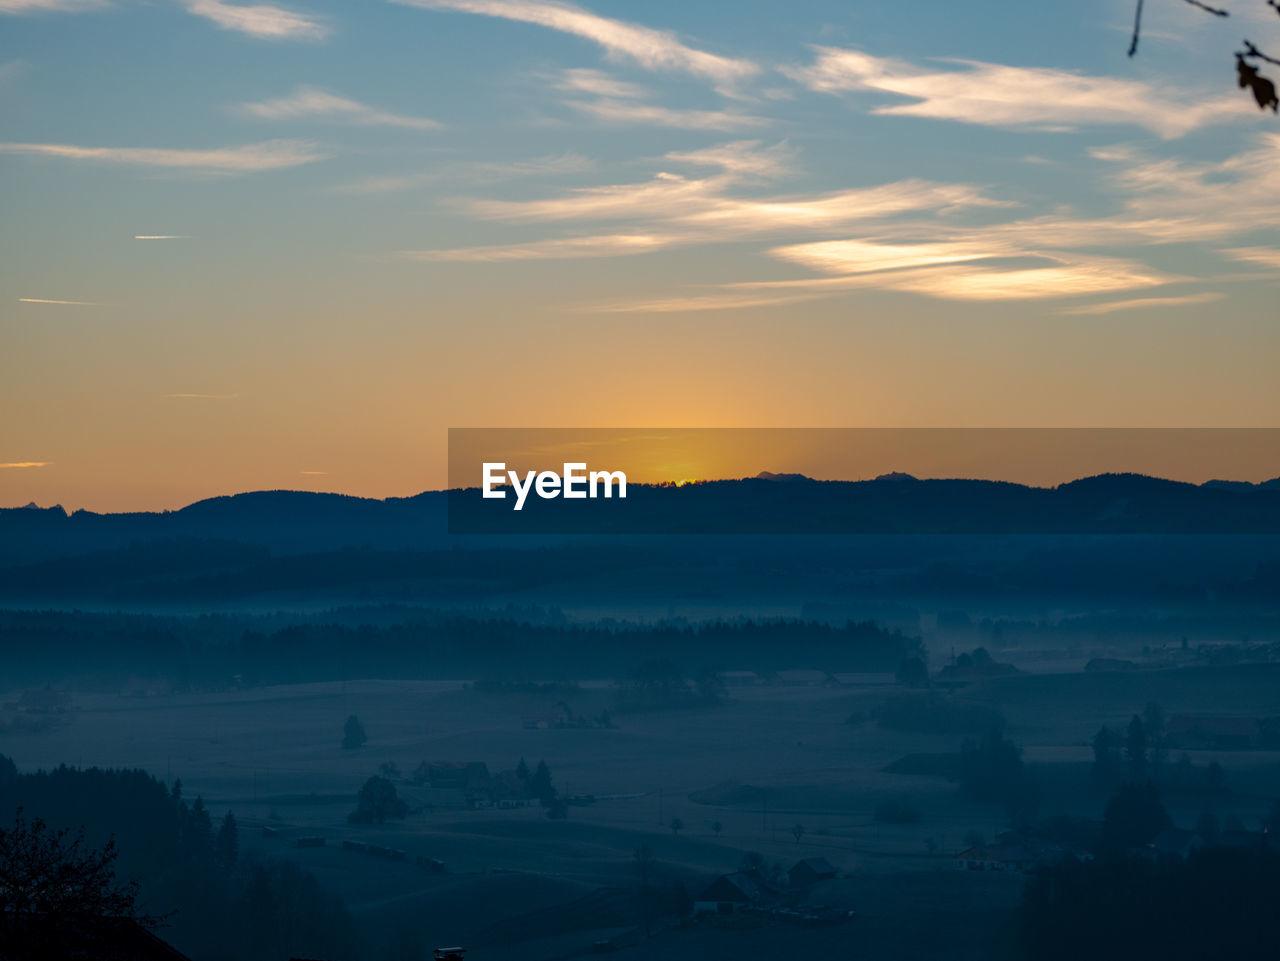 sunset, beauty in nature, sky, scenics - nature, tranquility, tranquil scene, cloud - sky, orange color, idyllic, mountain, nature, silhouette, no people, environment, non-urban scene, outdoors, landscape, mountain range, sun, hazy